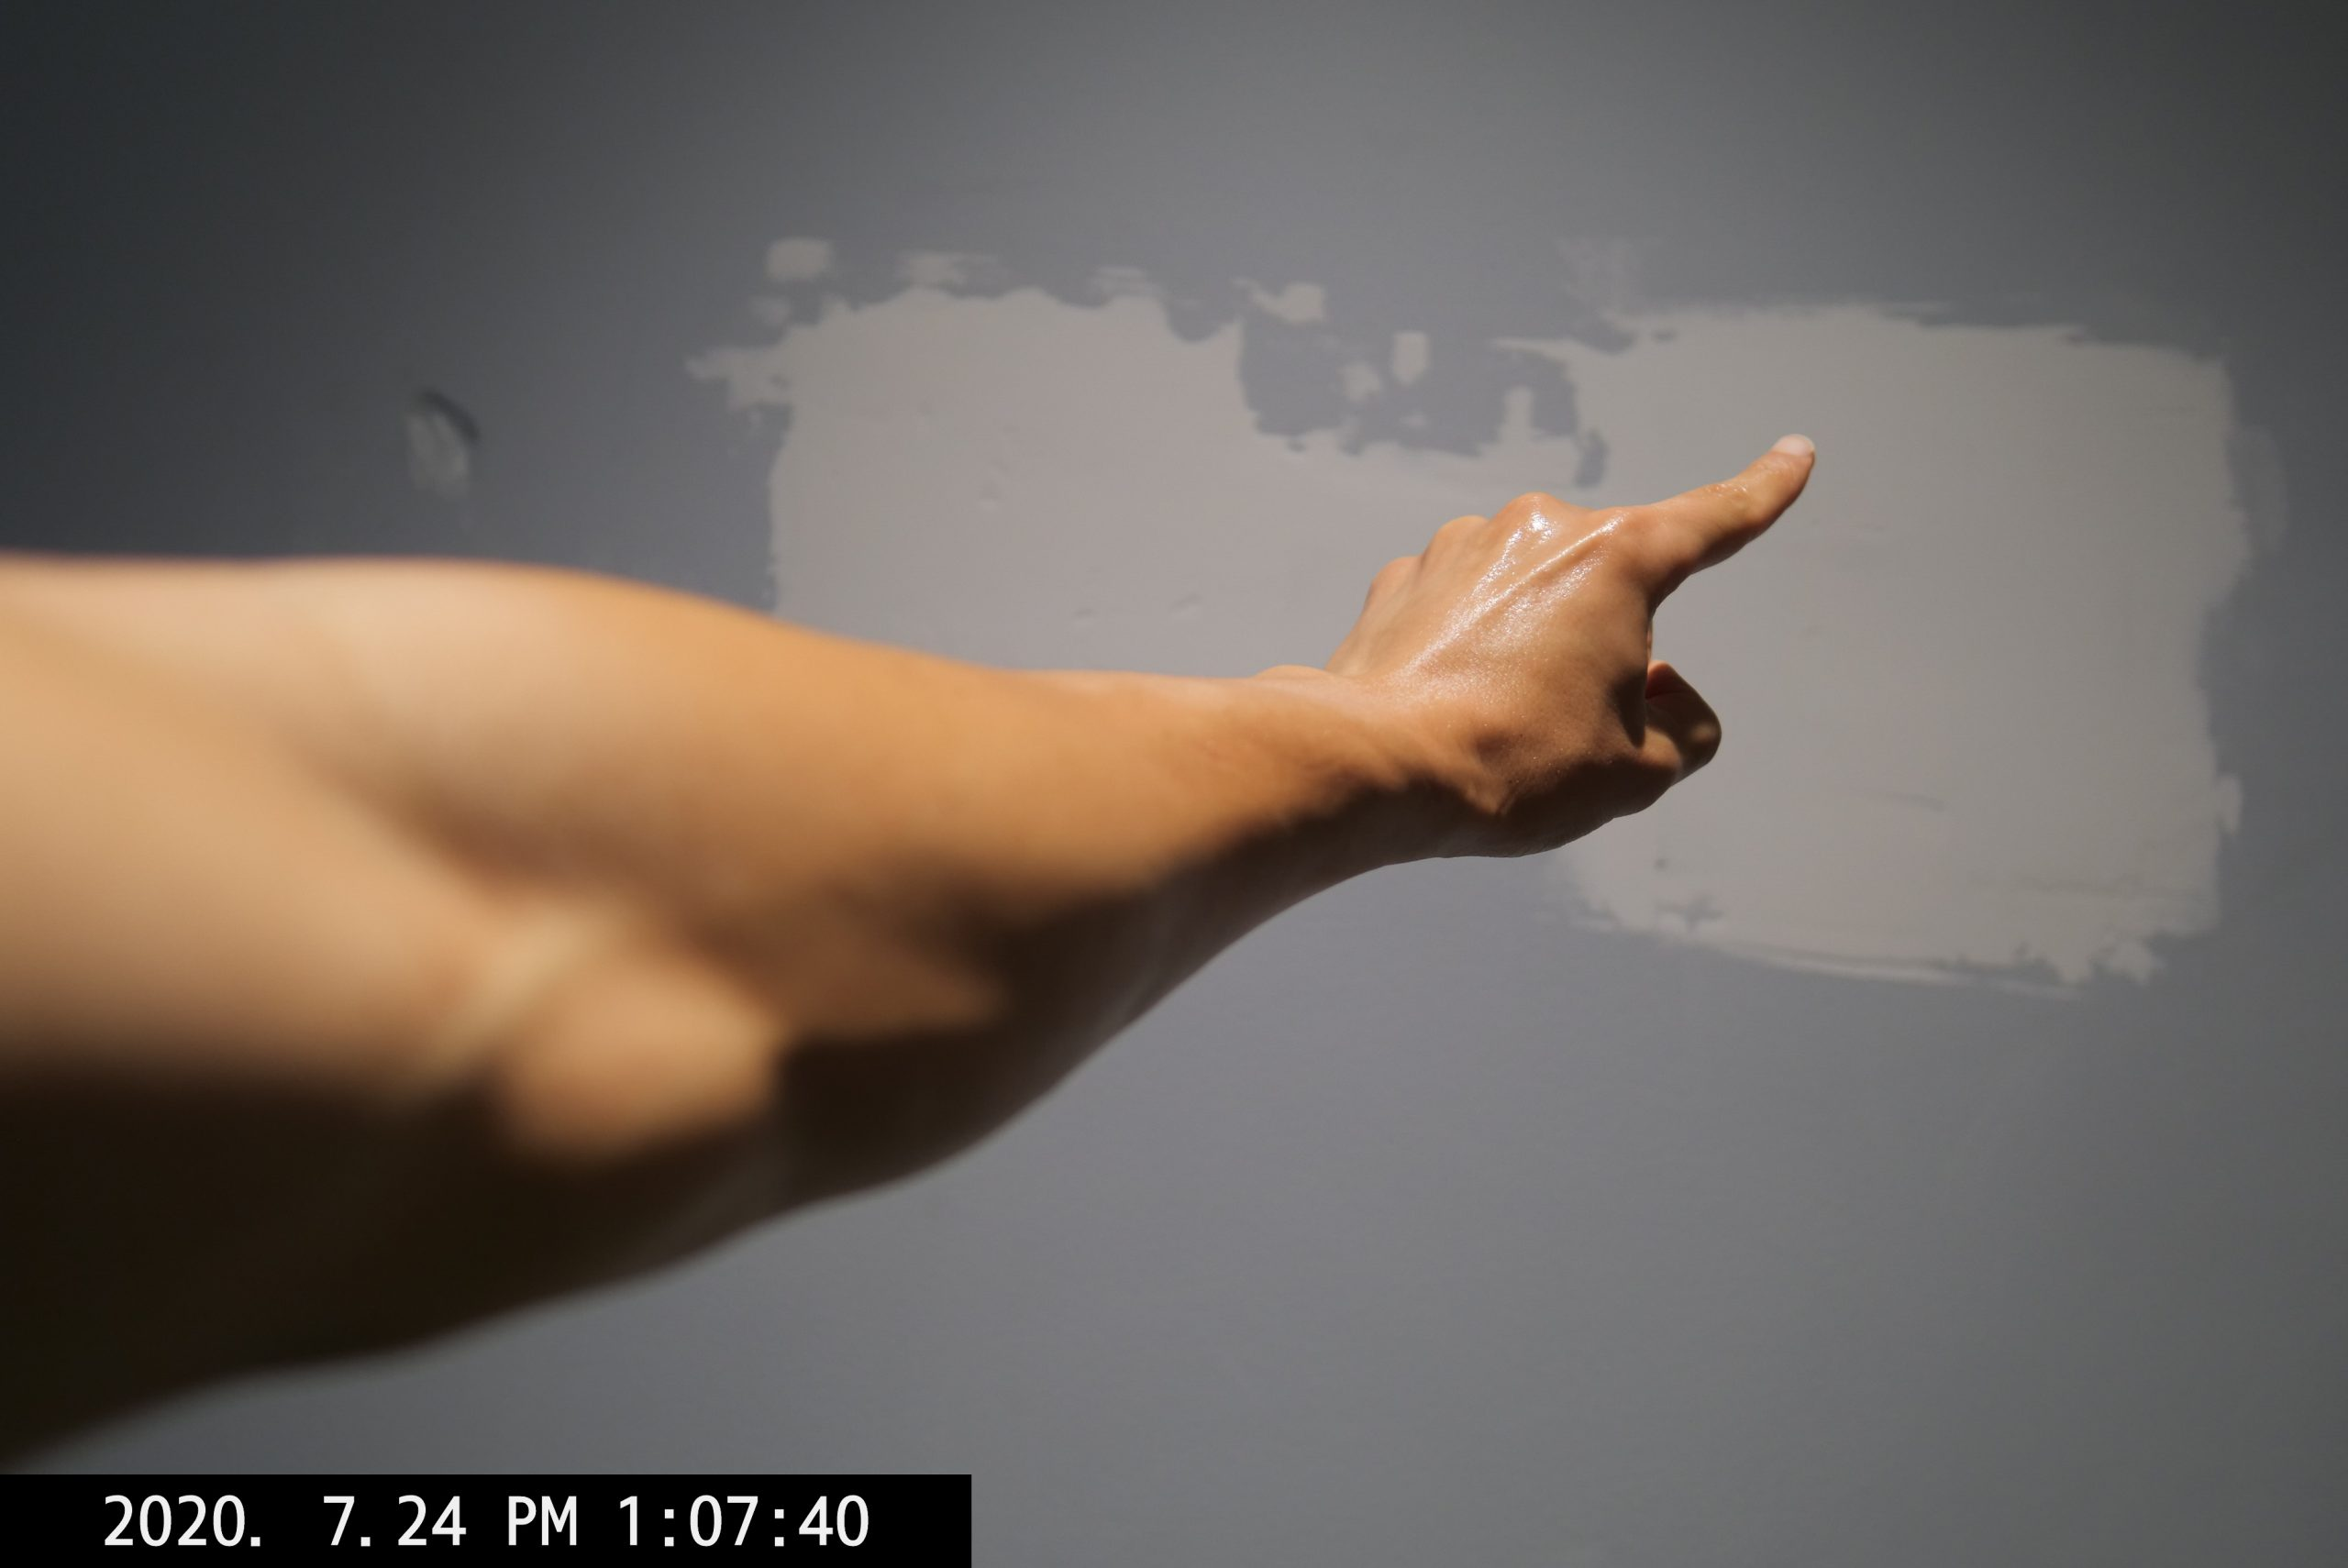 ERIC KIM selfie arm finger pointing